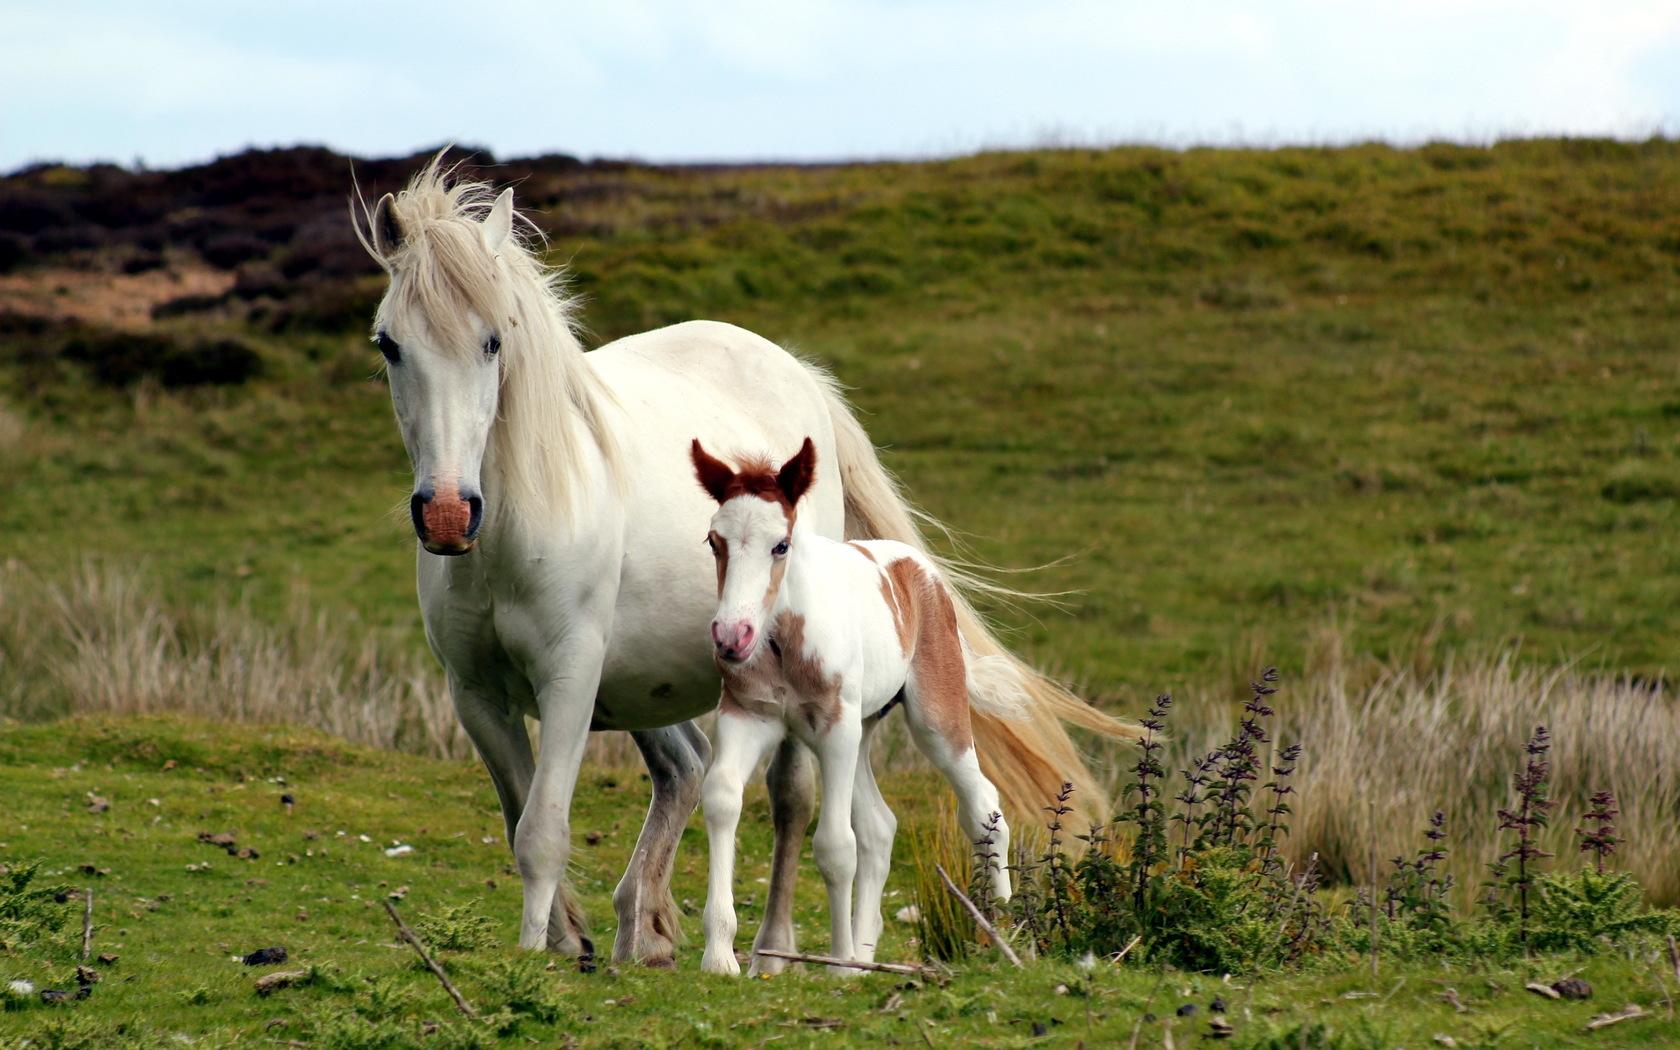 بالصور صور خيل , صور خيول جميلة 4344 8